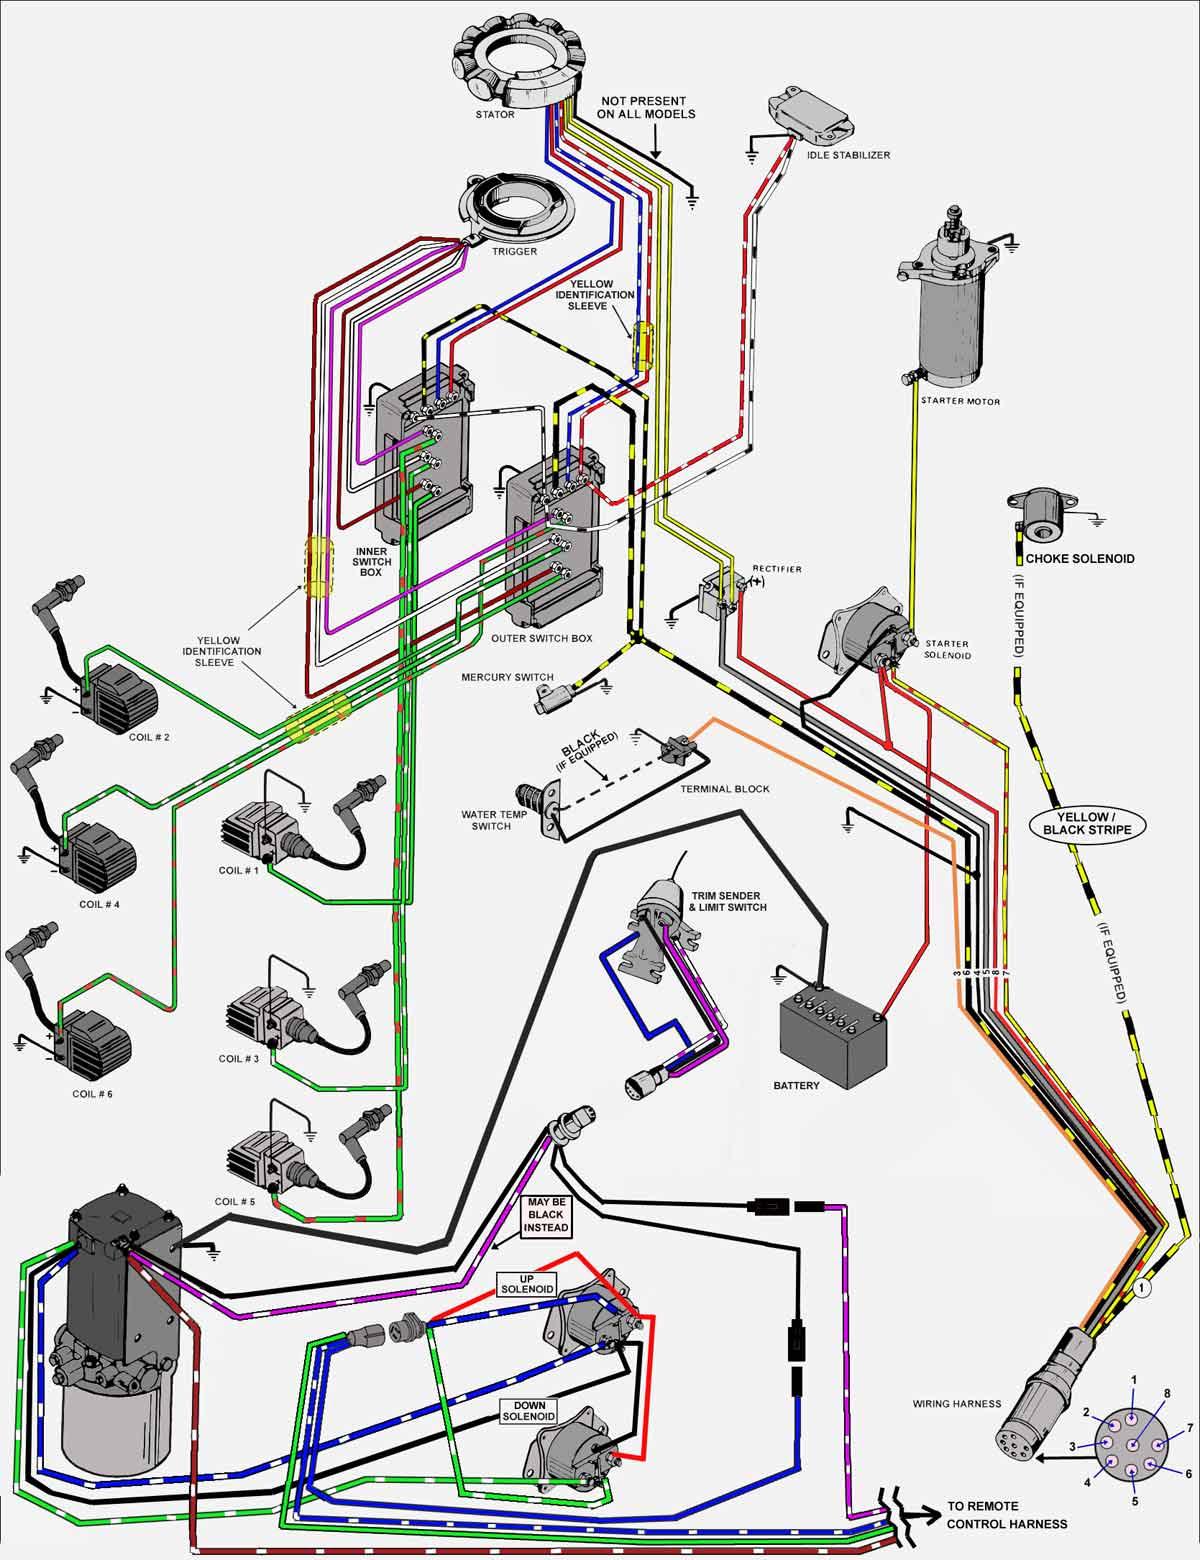 Mercury 115 2 Stroke Wiring Diagram Craftsman Chainsaw Engine Diagram Bobcate S70 Yenpancane Jeanjaures37 Fr